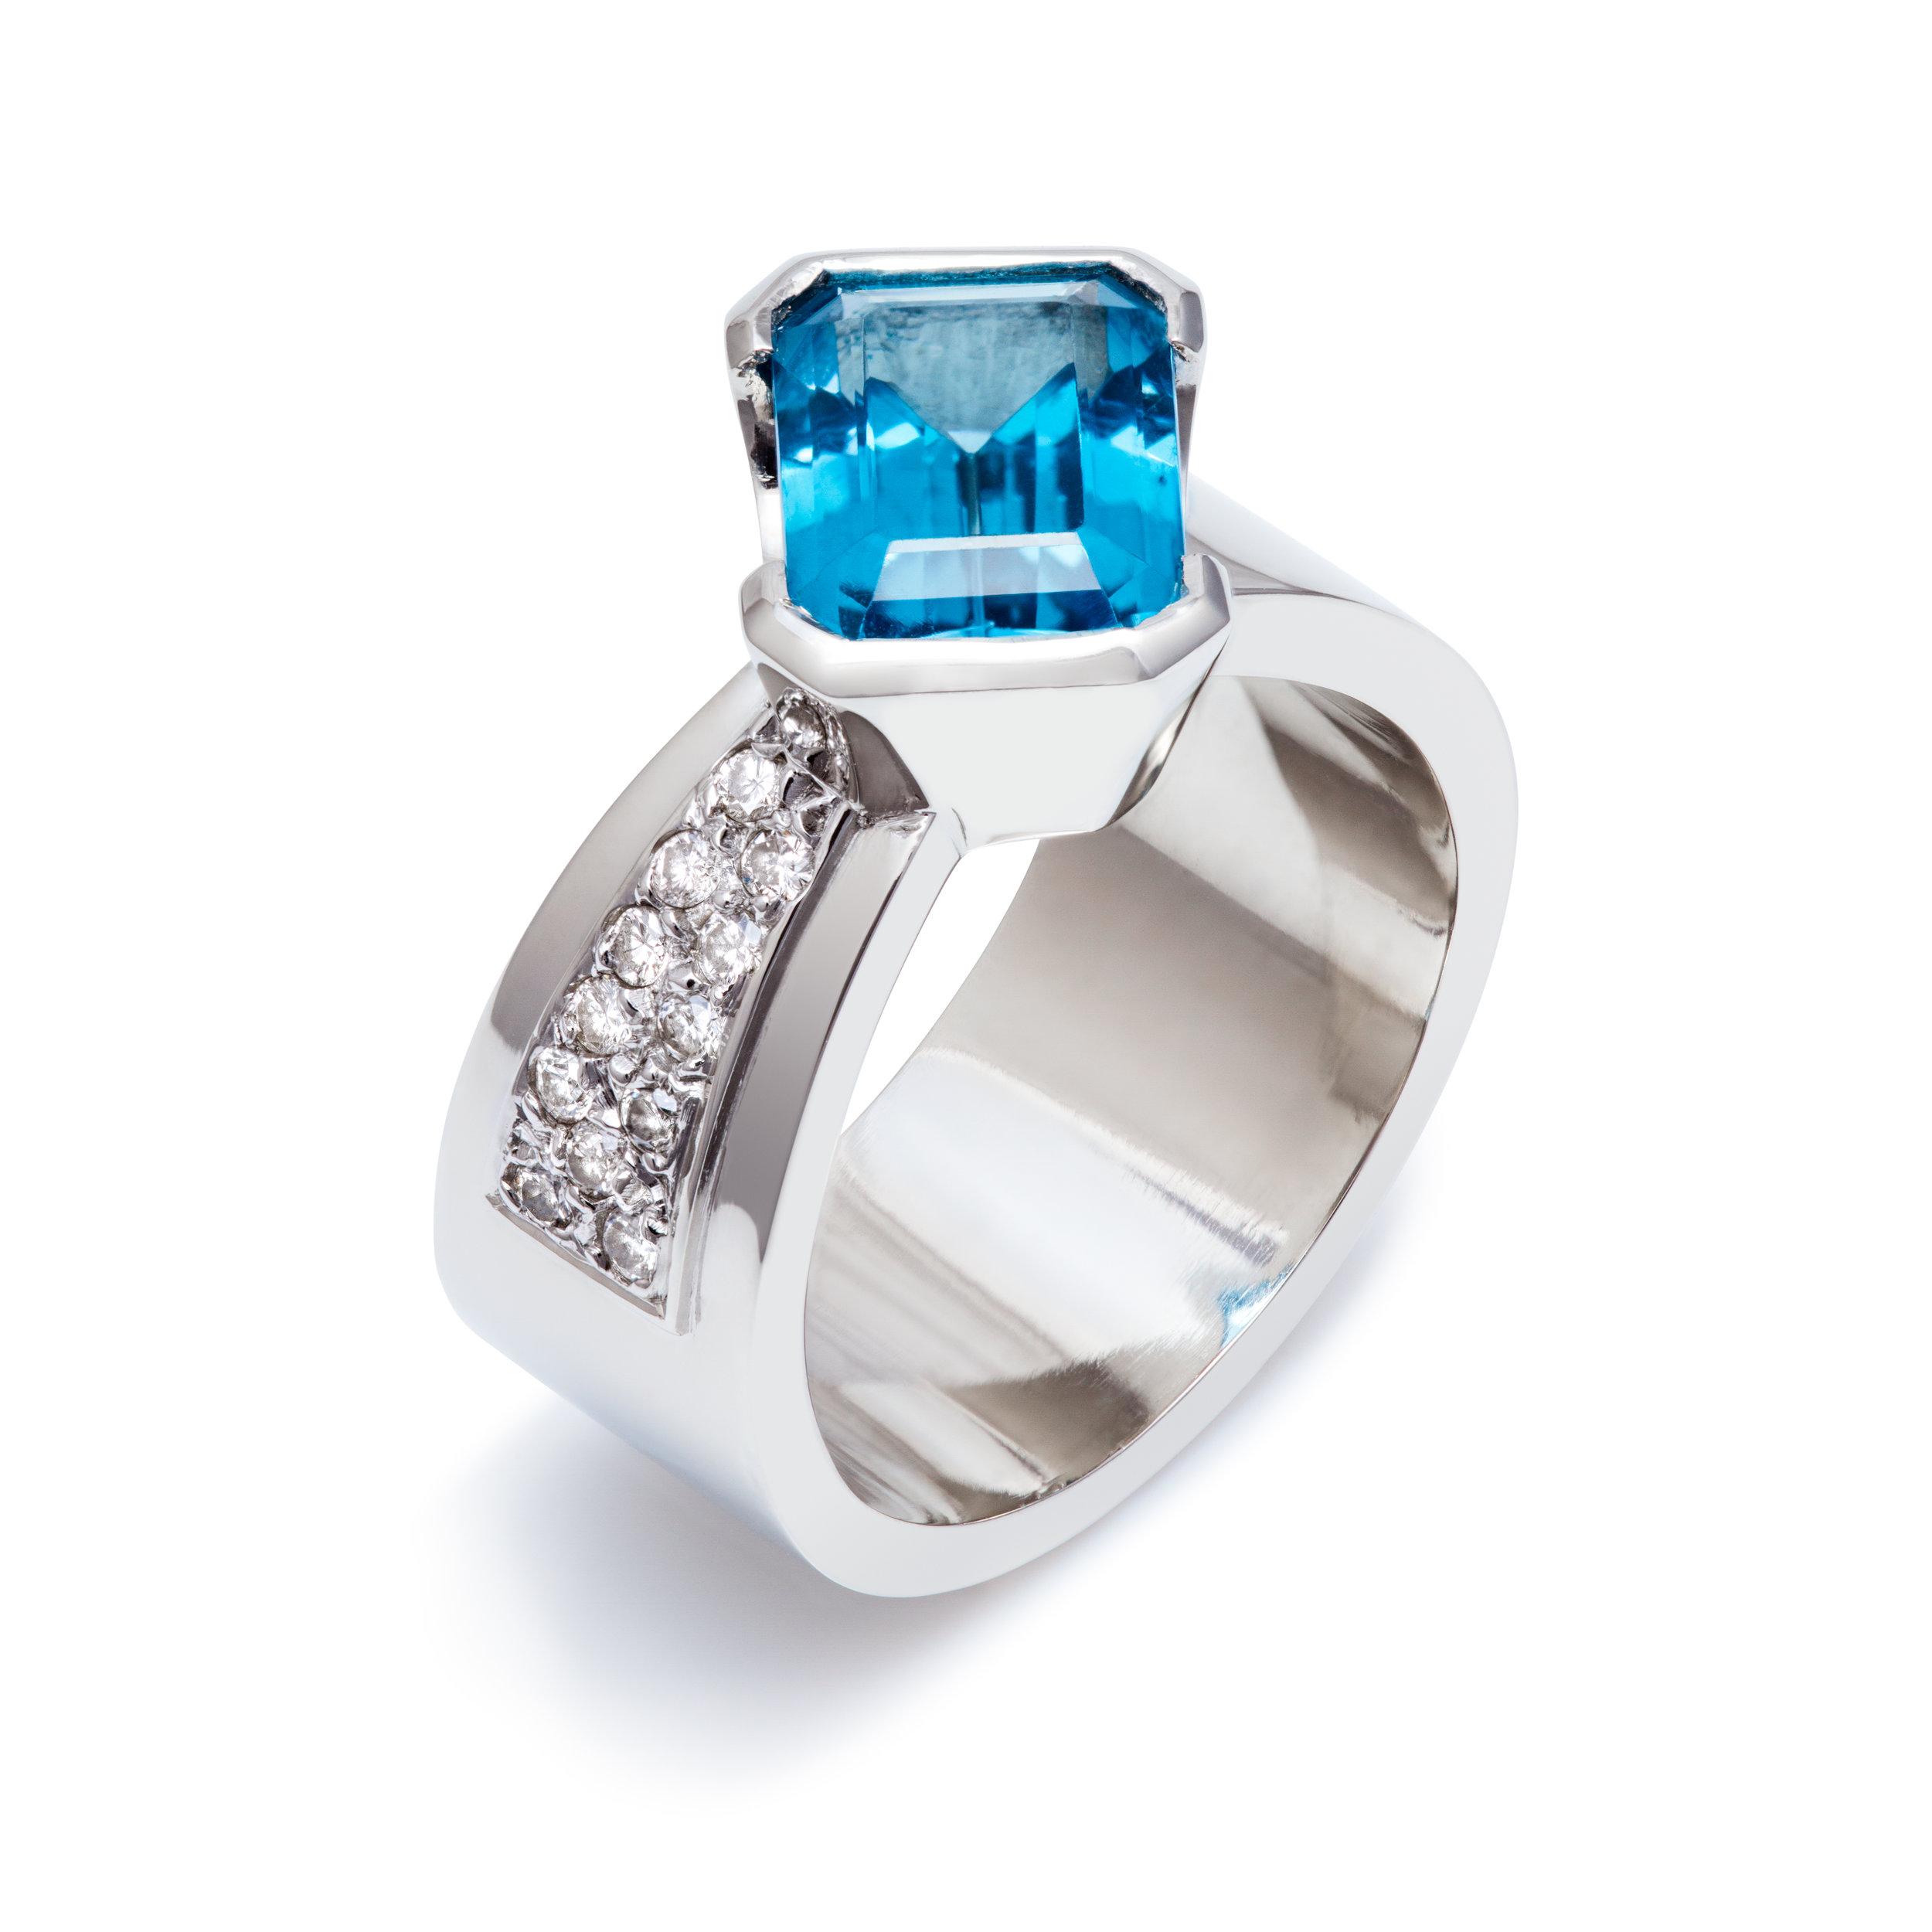 Bespoke platinum, blue topaz and diamond ring commission